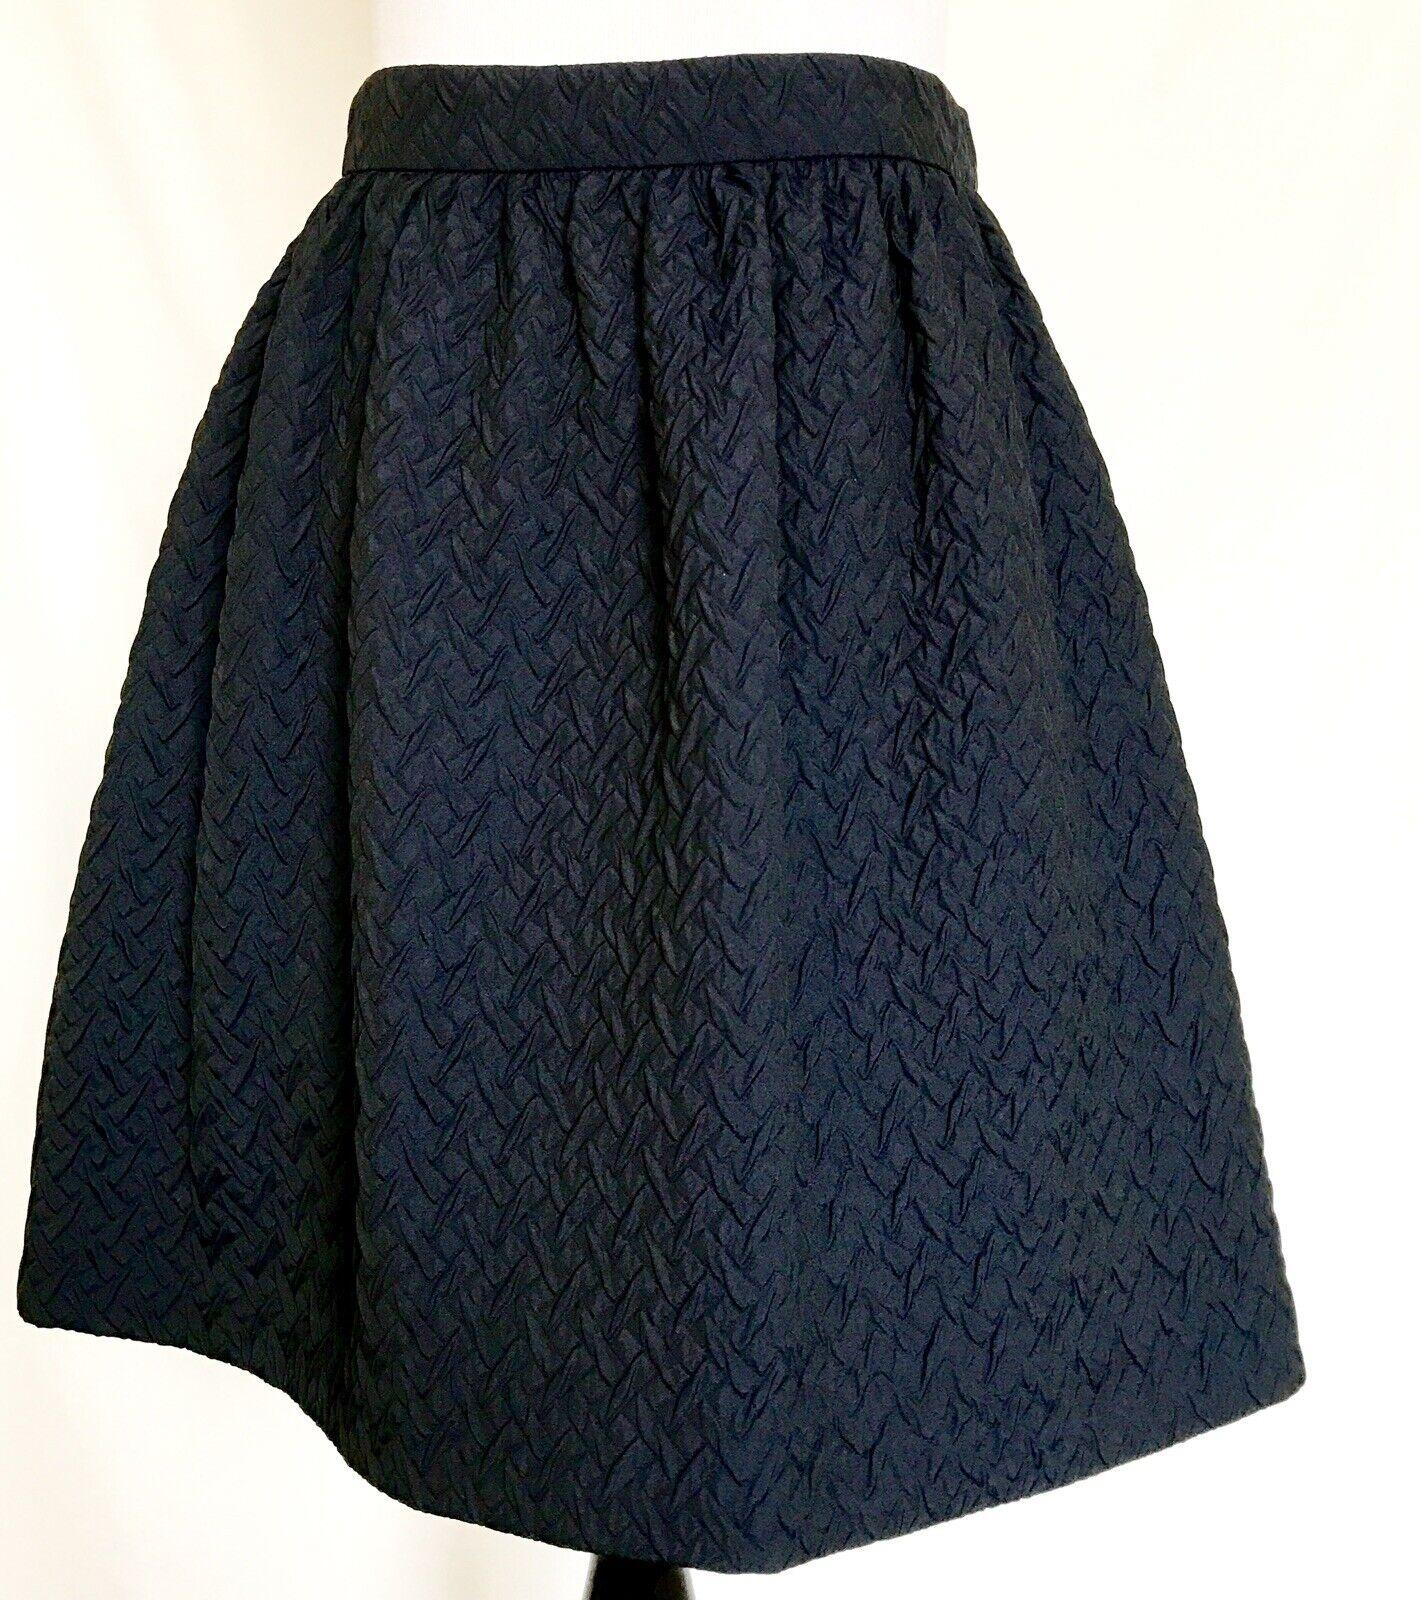 PRADA Blau Full Skirt. NWT Größe Italian 40 US 4 Retails  1485 Price  356